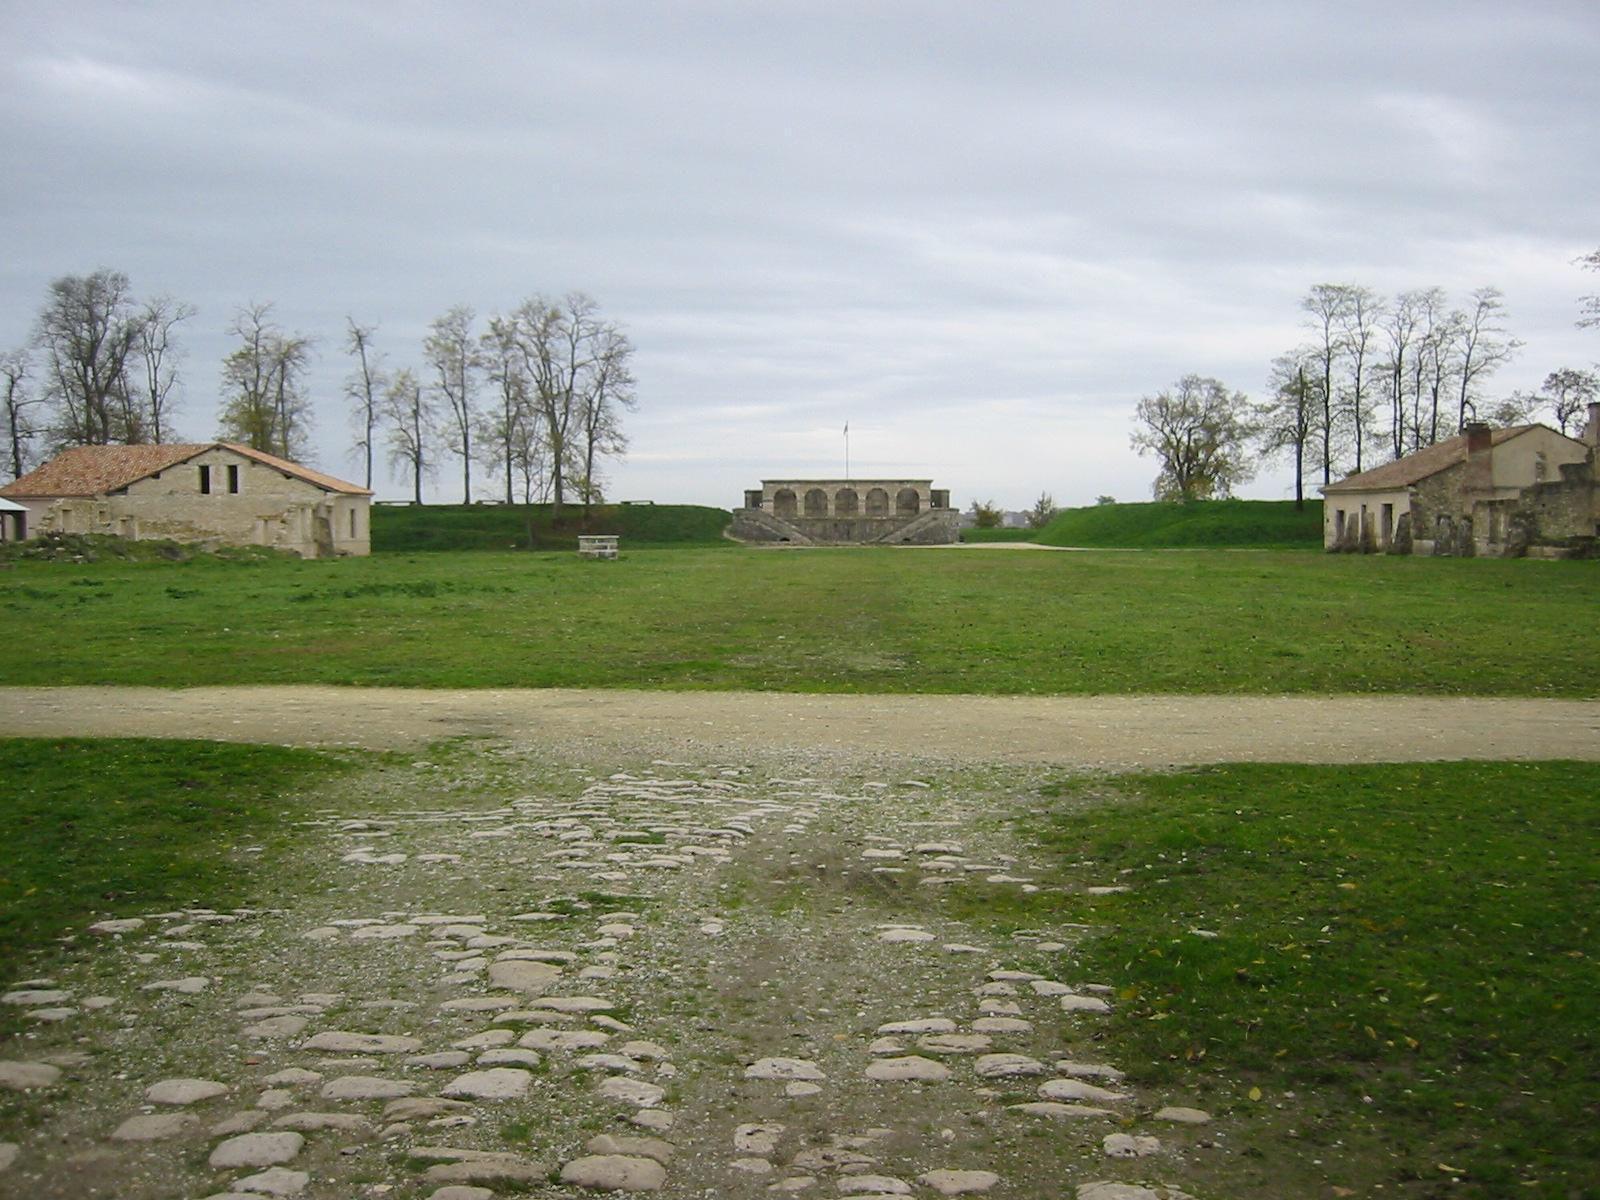 Image : Cussac-Fort-médoc